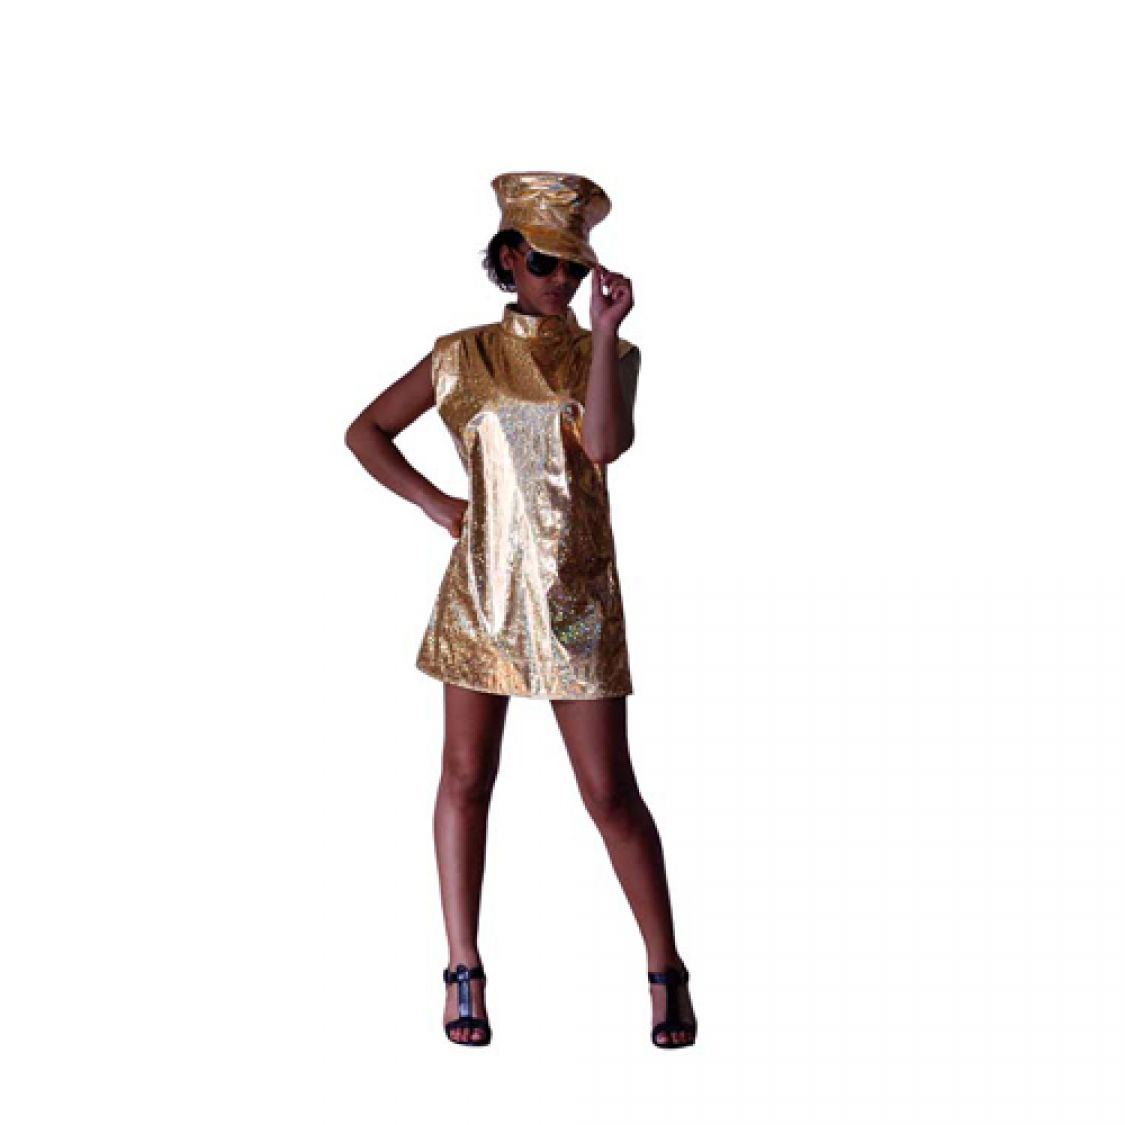 d guisement disco femme robe 70. Black Bedroom Furniture Sets. Home Design Ideas